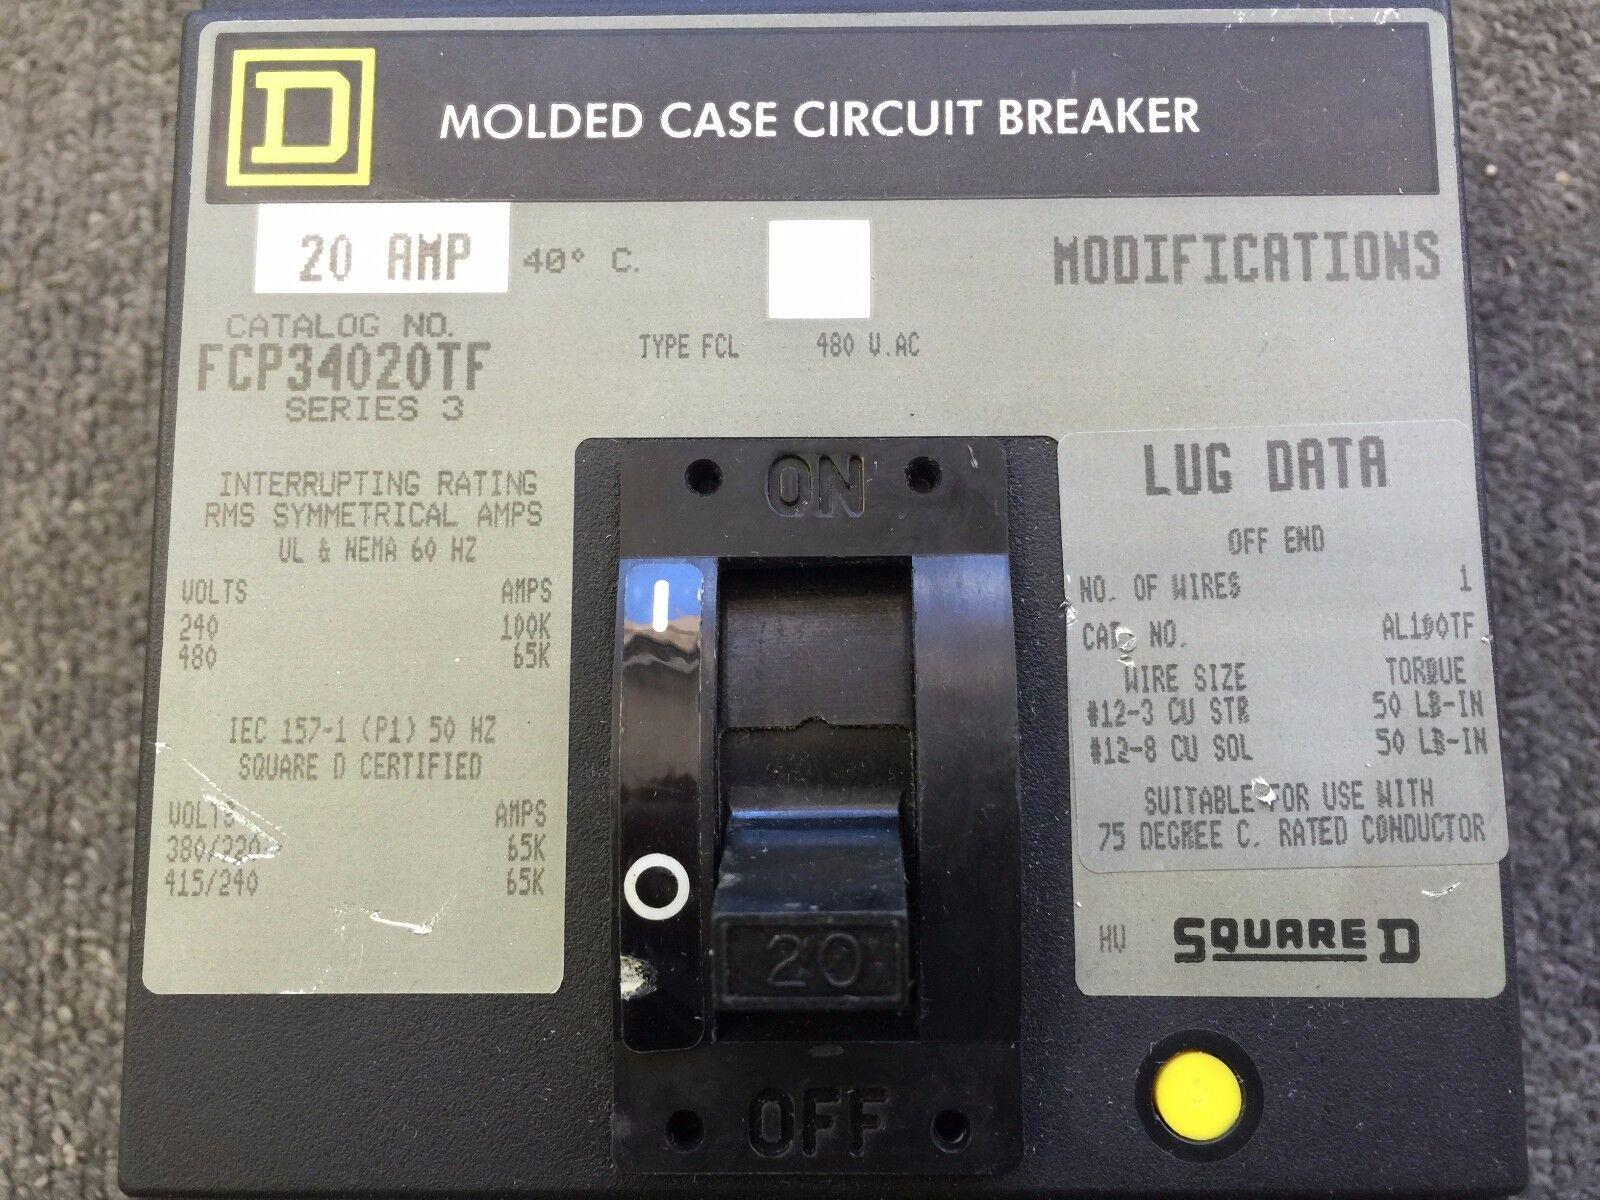 Square D Molded Case Circuit Breaker 20 Amp 480v 3 Pole FCP34020TF ...